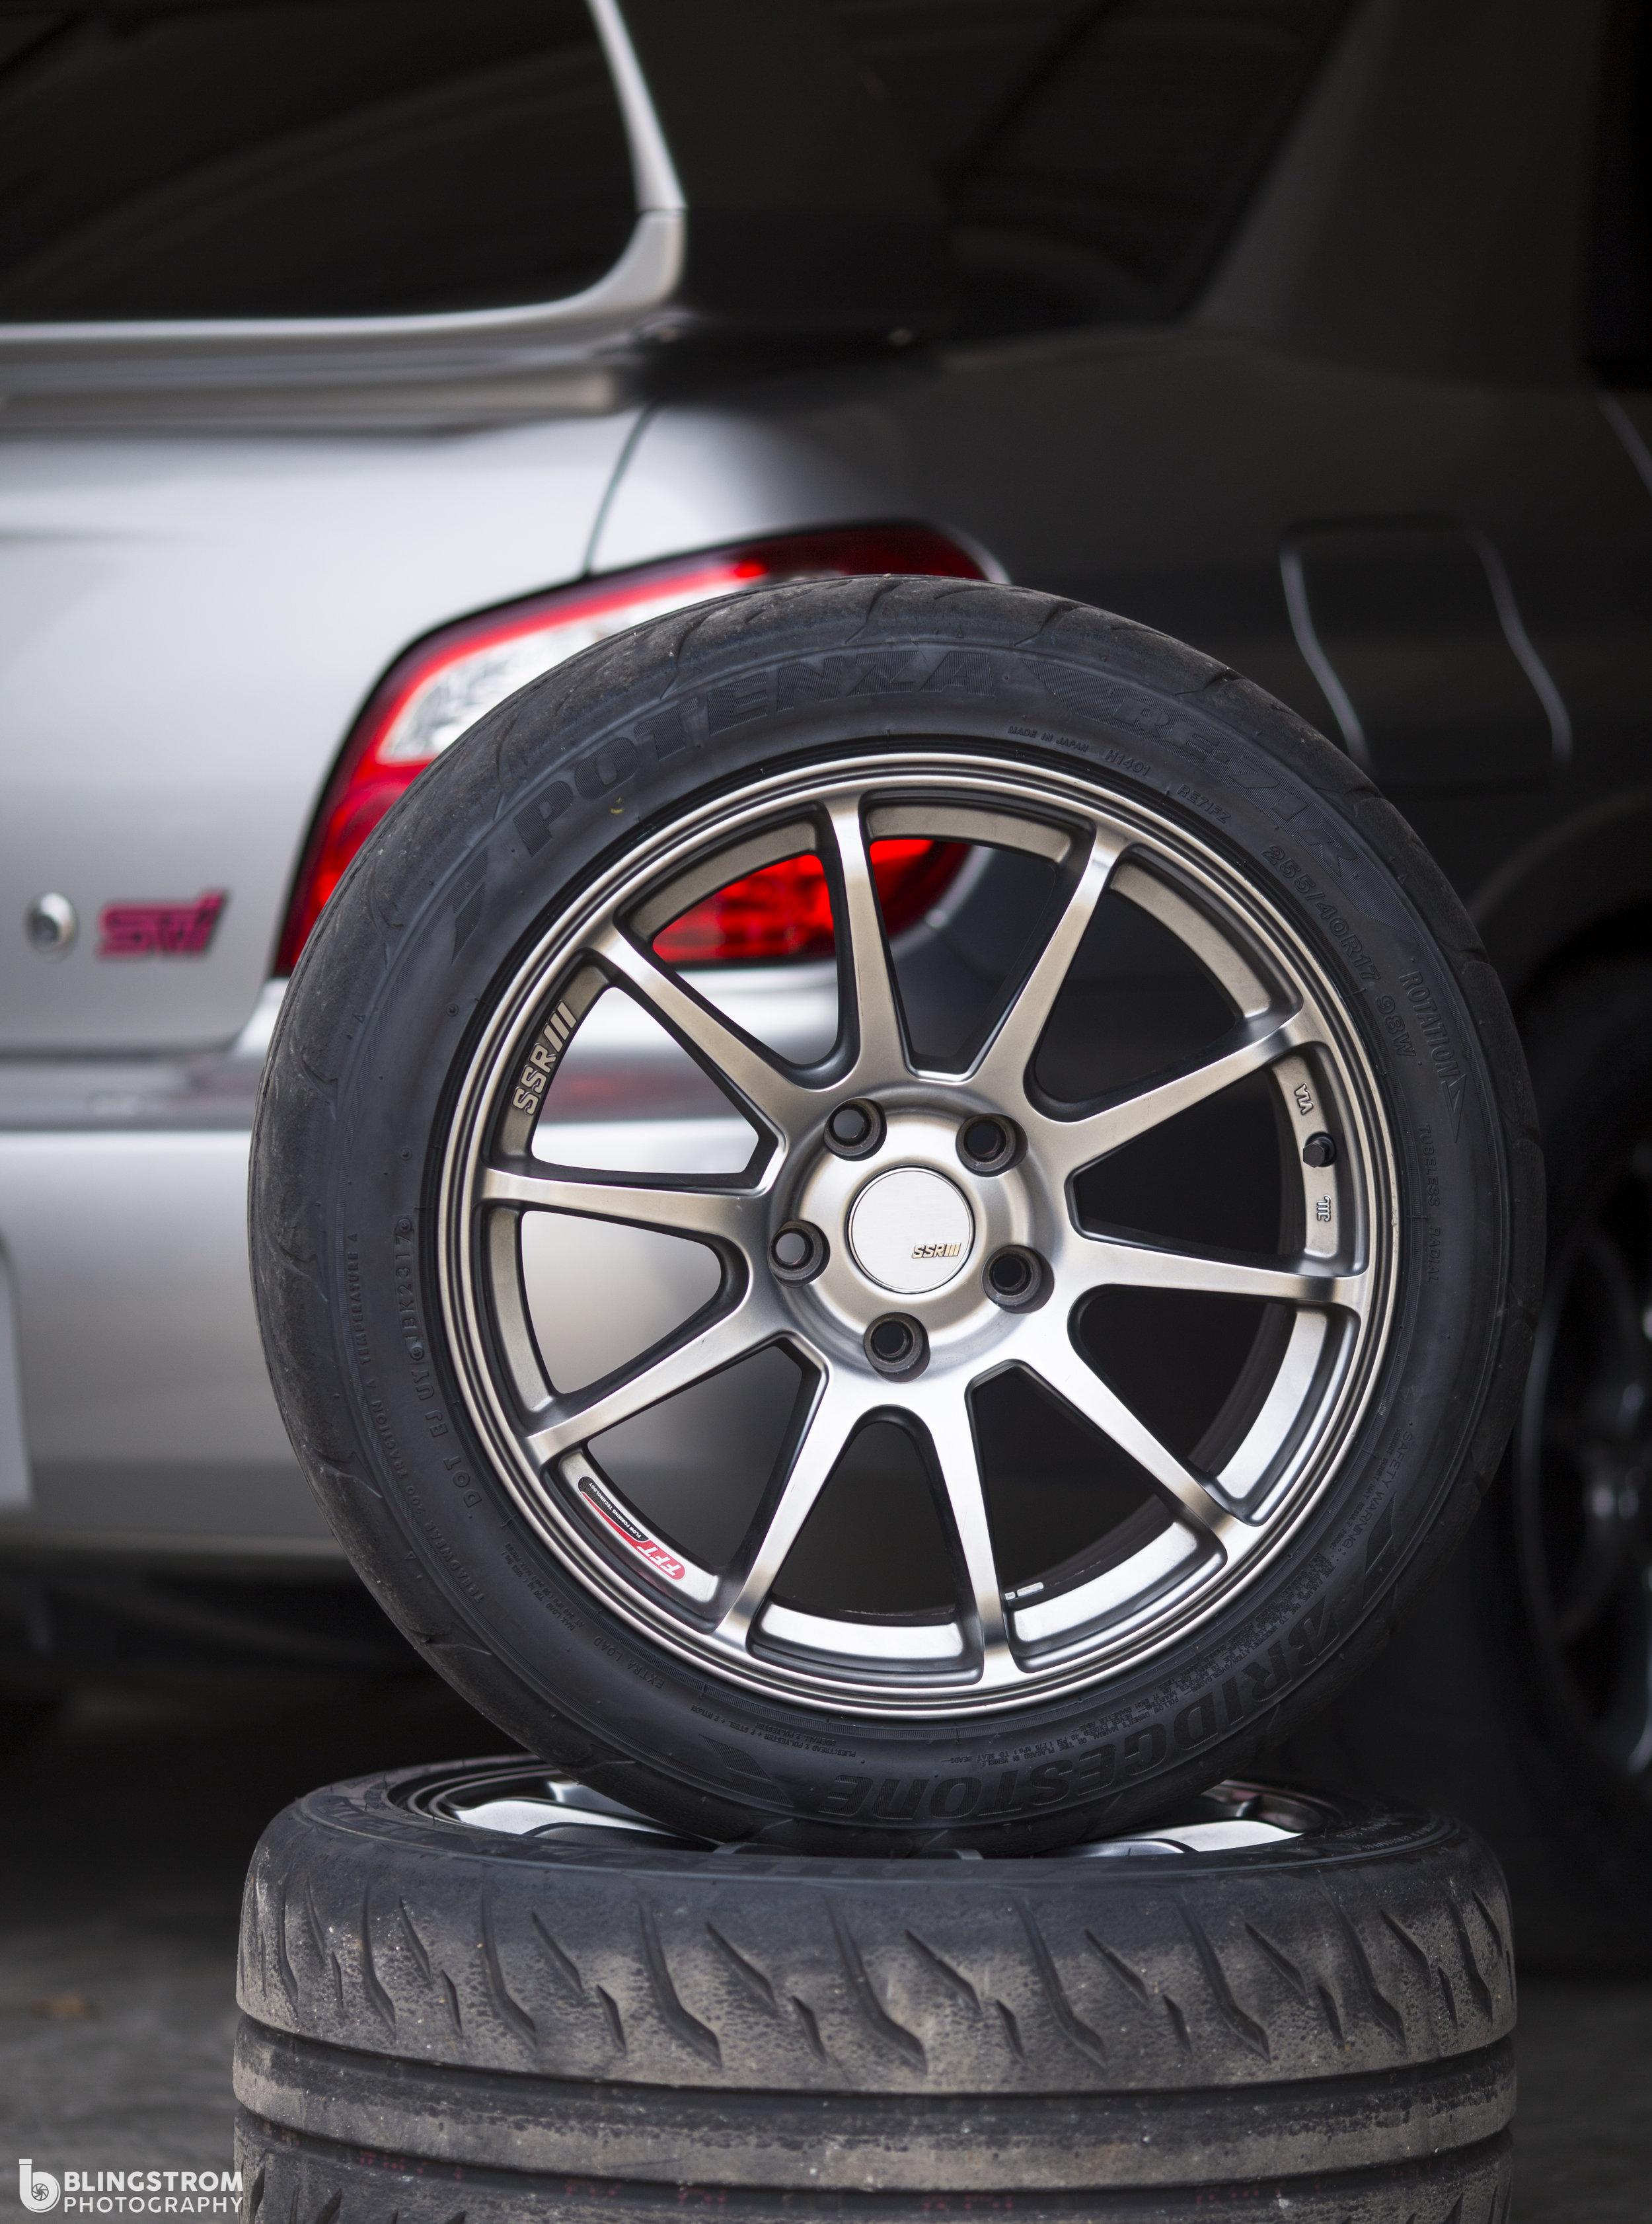 Bridgestone Potenza Re-71r 255/40R17